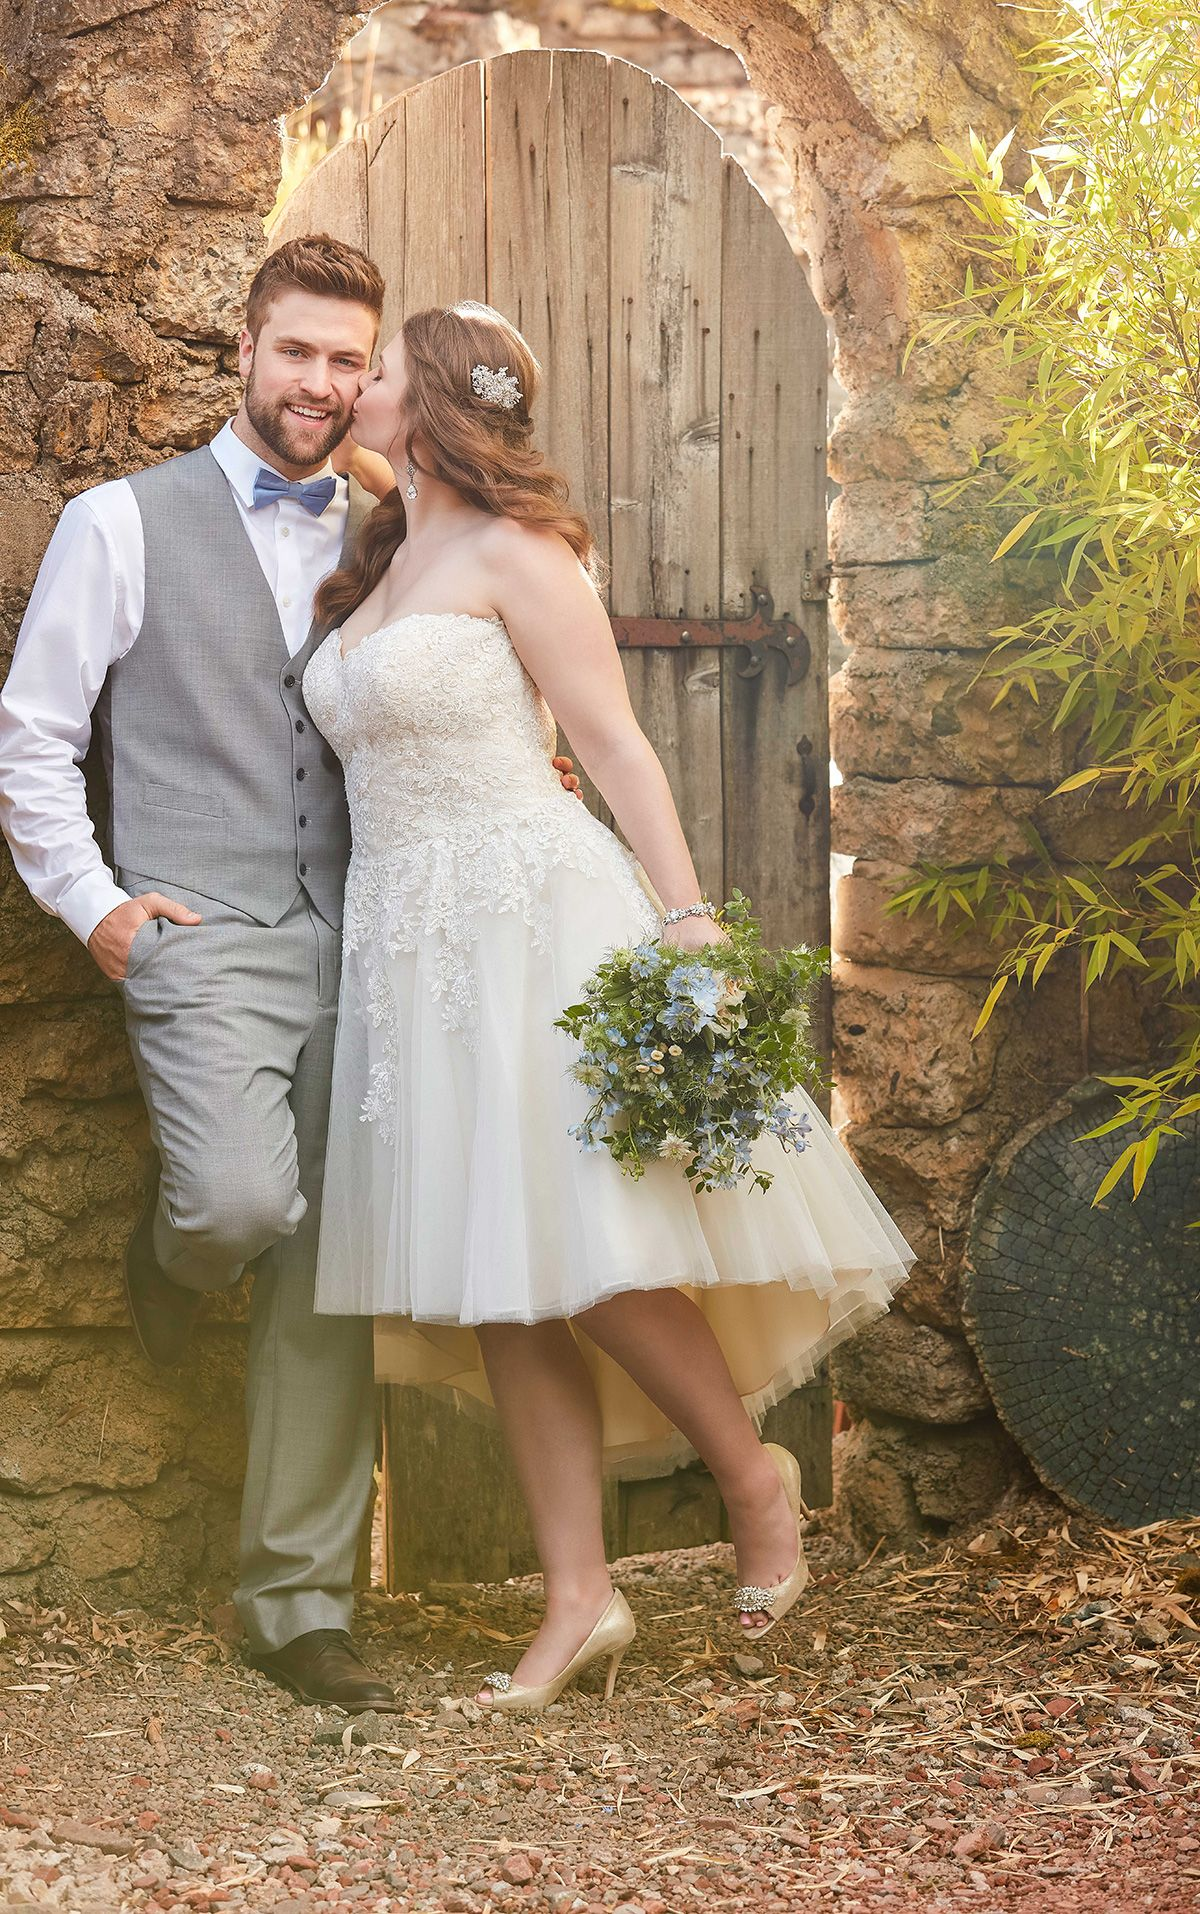 Short Wedding Dress With High Low Skirt Essense Of Australia Wedding Dresses High Low Short Wedding Gowns Essense Of Australia Wedding Dresses [ 1914 x 1200 Pixel ]